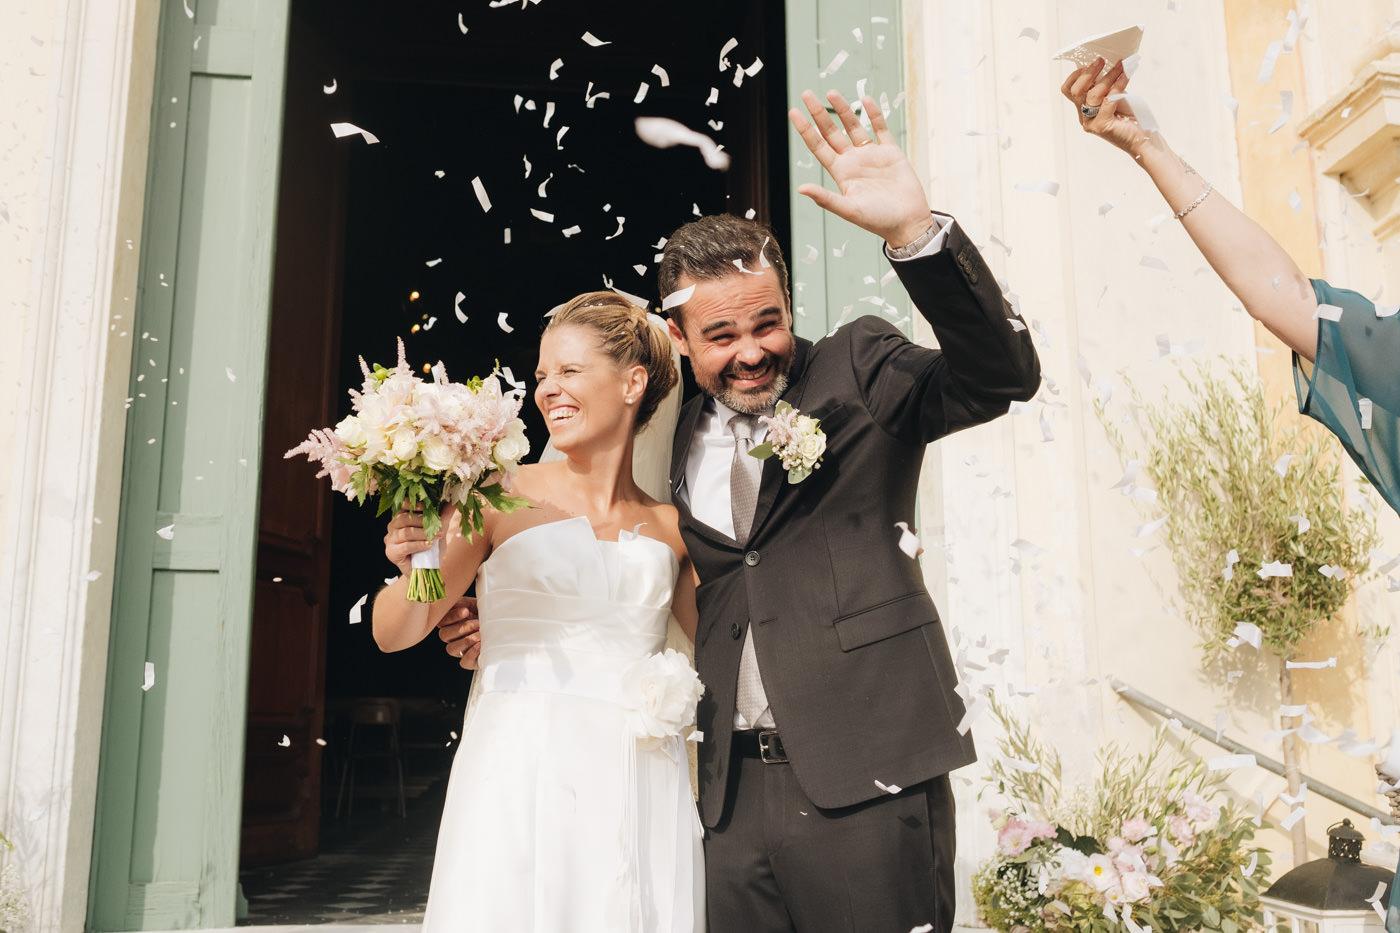 matrimoni_all_italiana_fotografo_matrimonio_cinque_terre-30.jpg